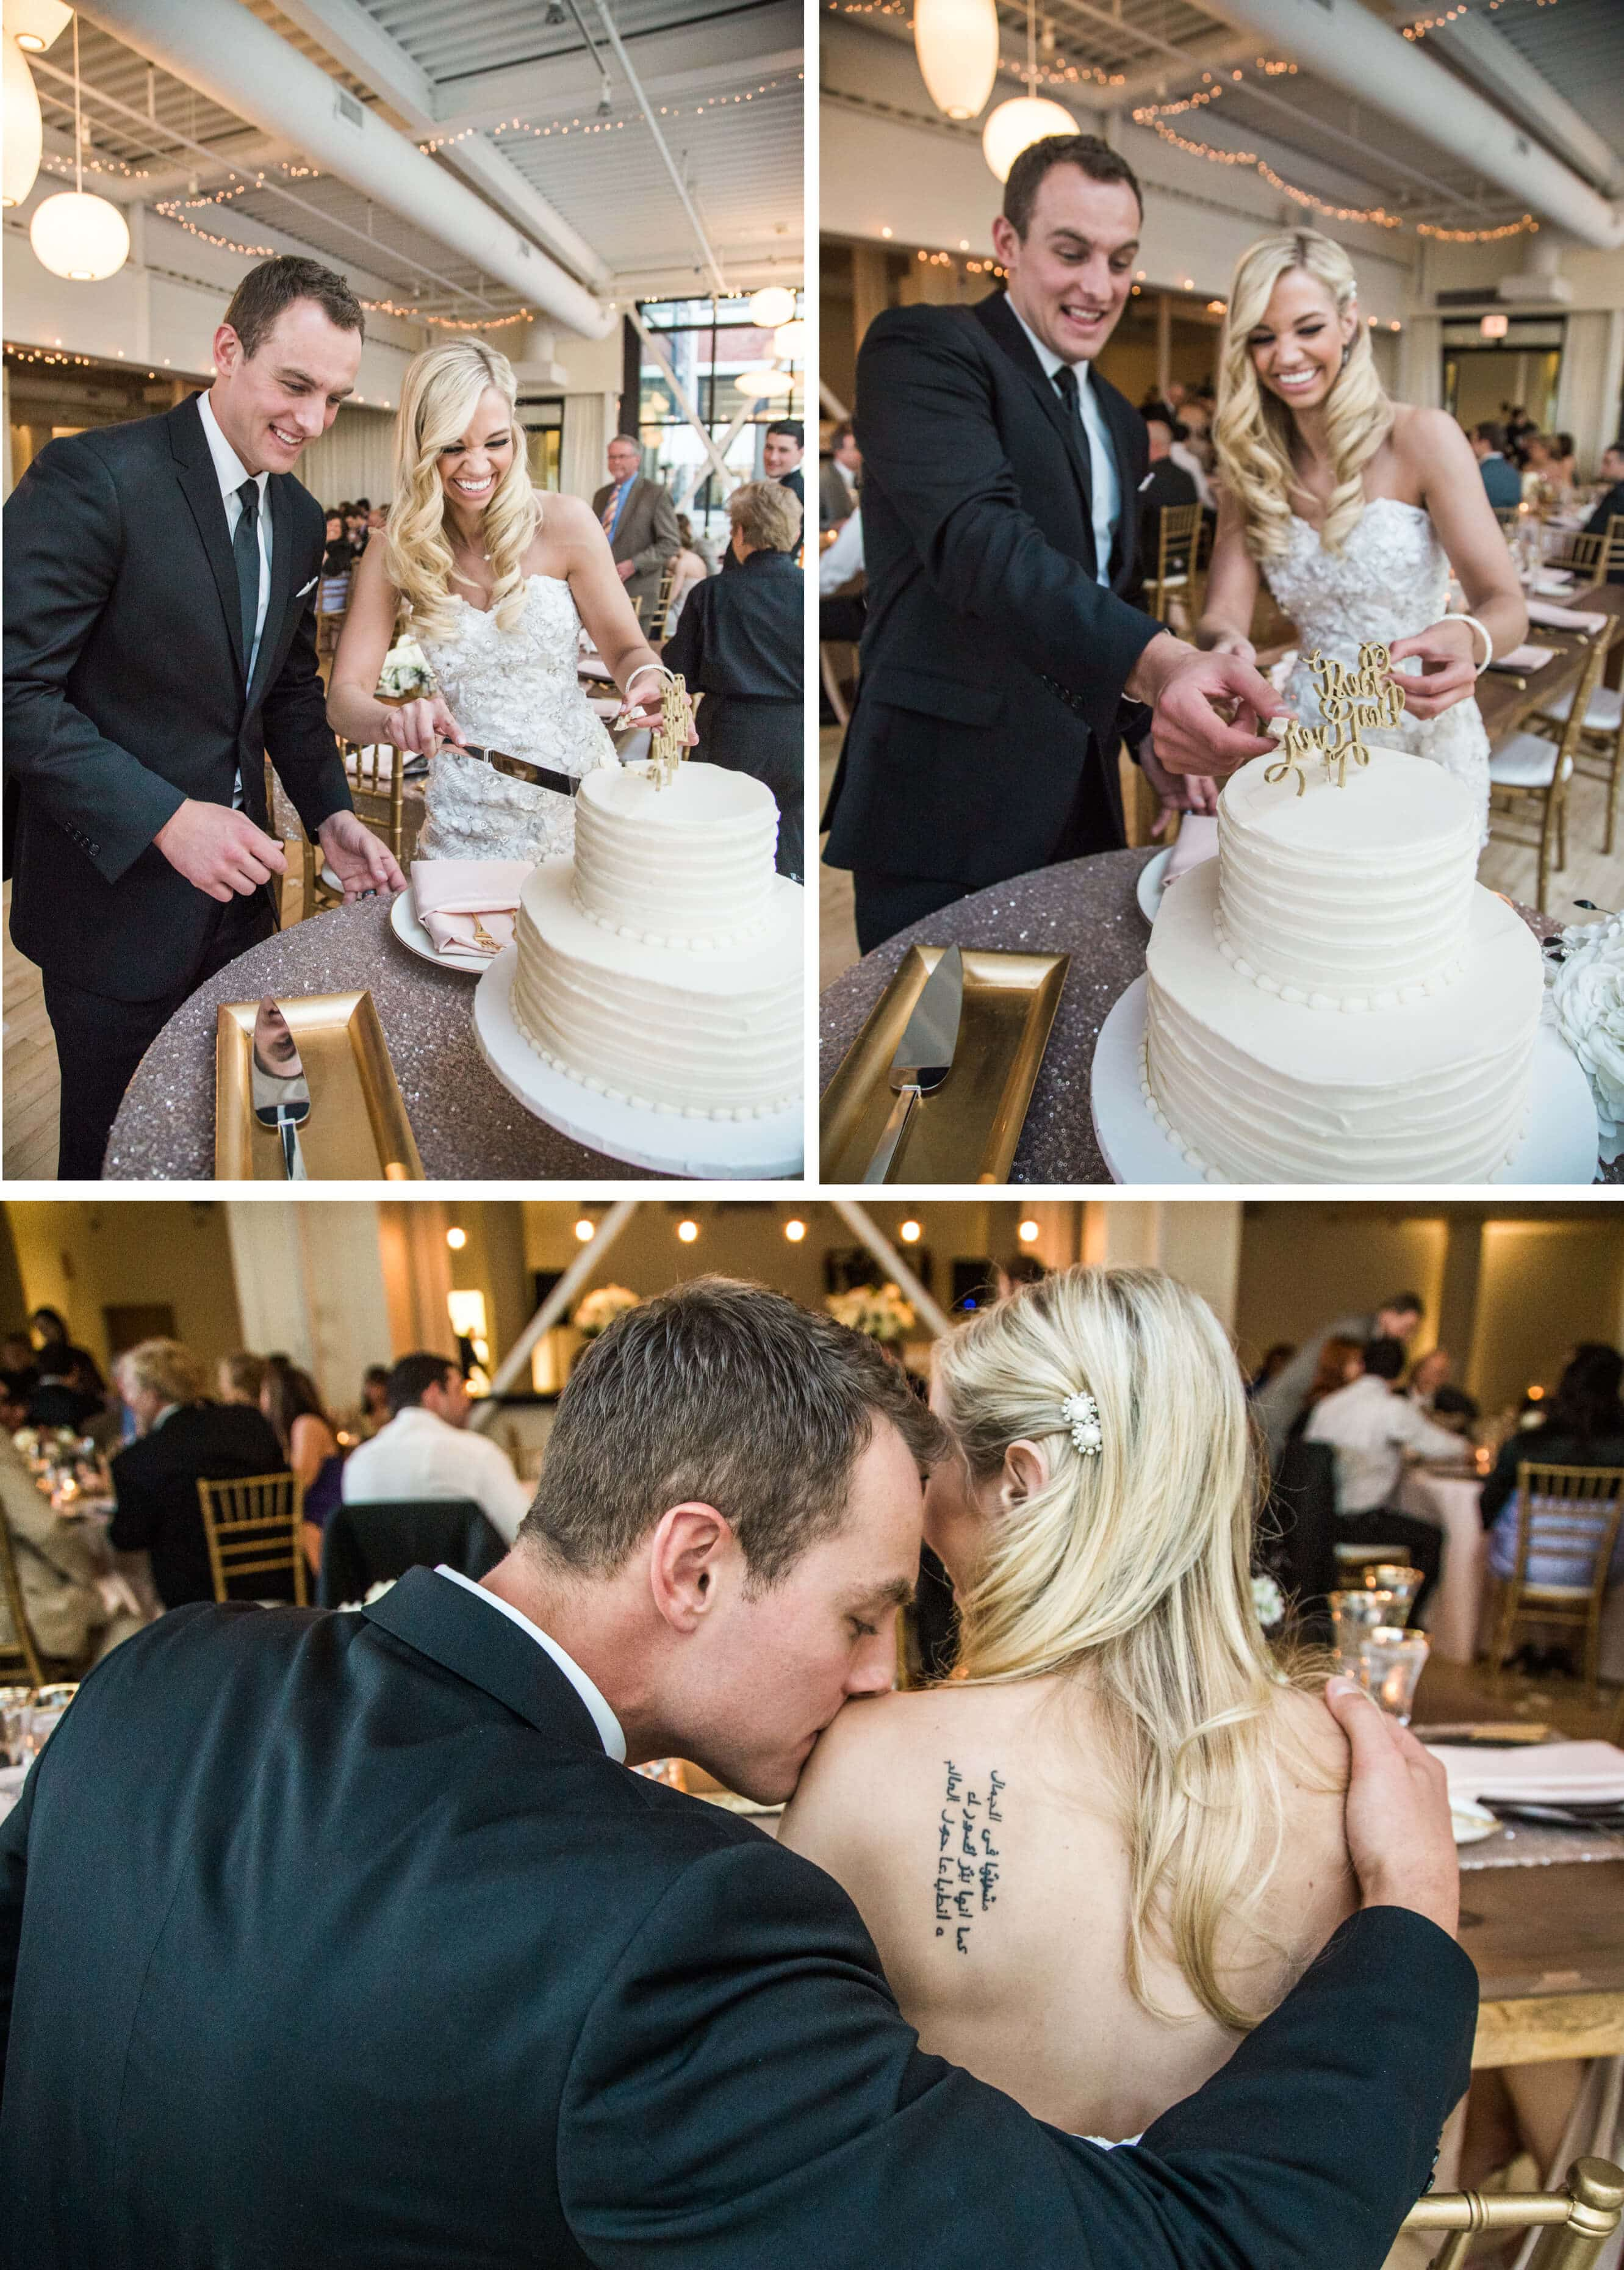 Chicago Greenhouse Loft cake cutting at reception _ Brighton Wedding Photographer